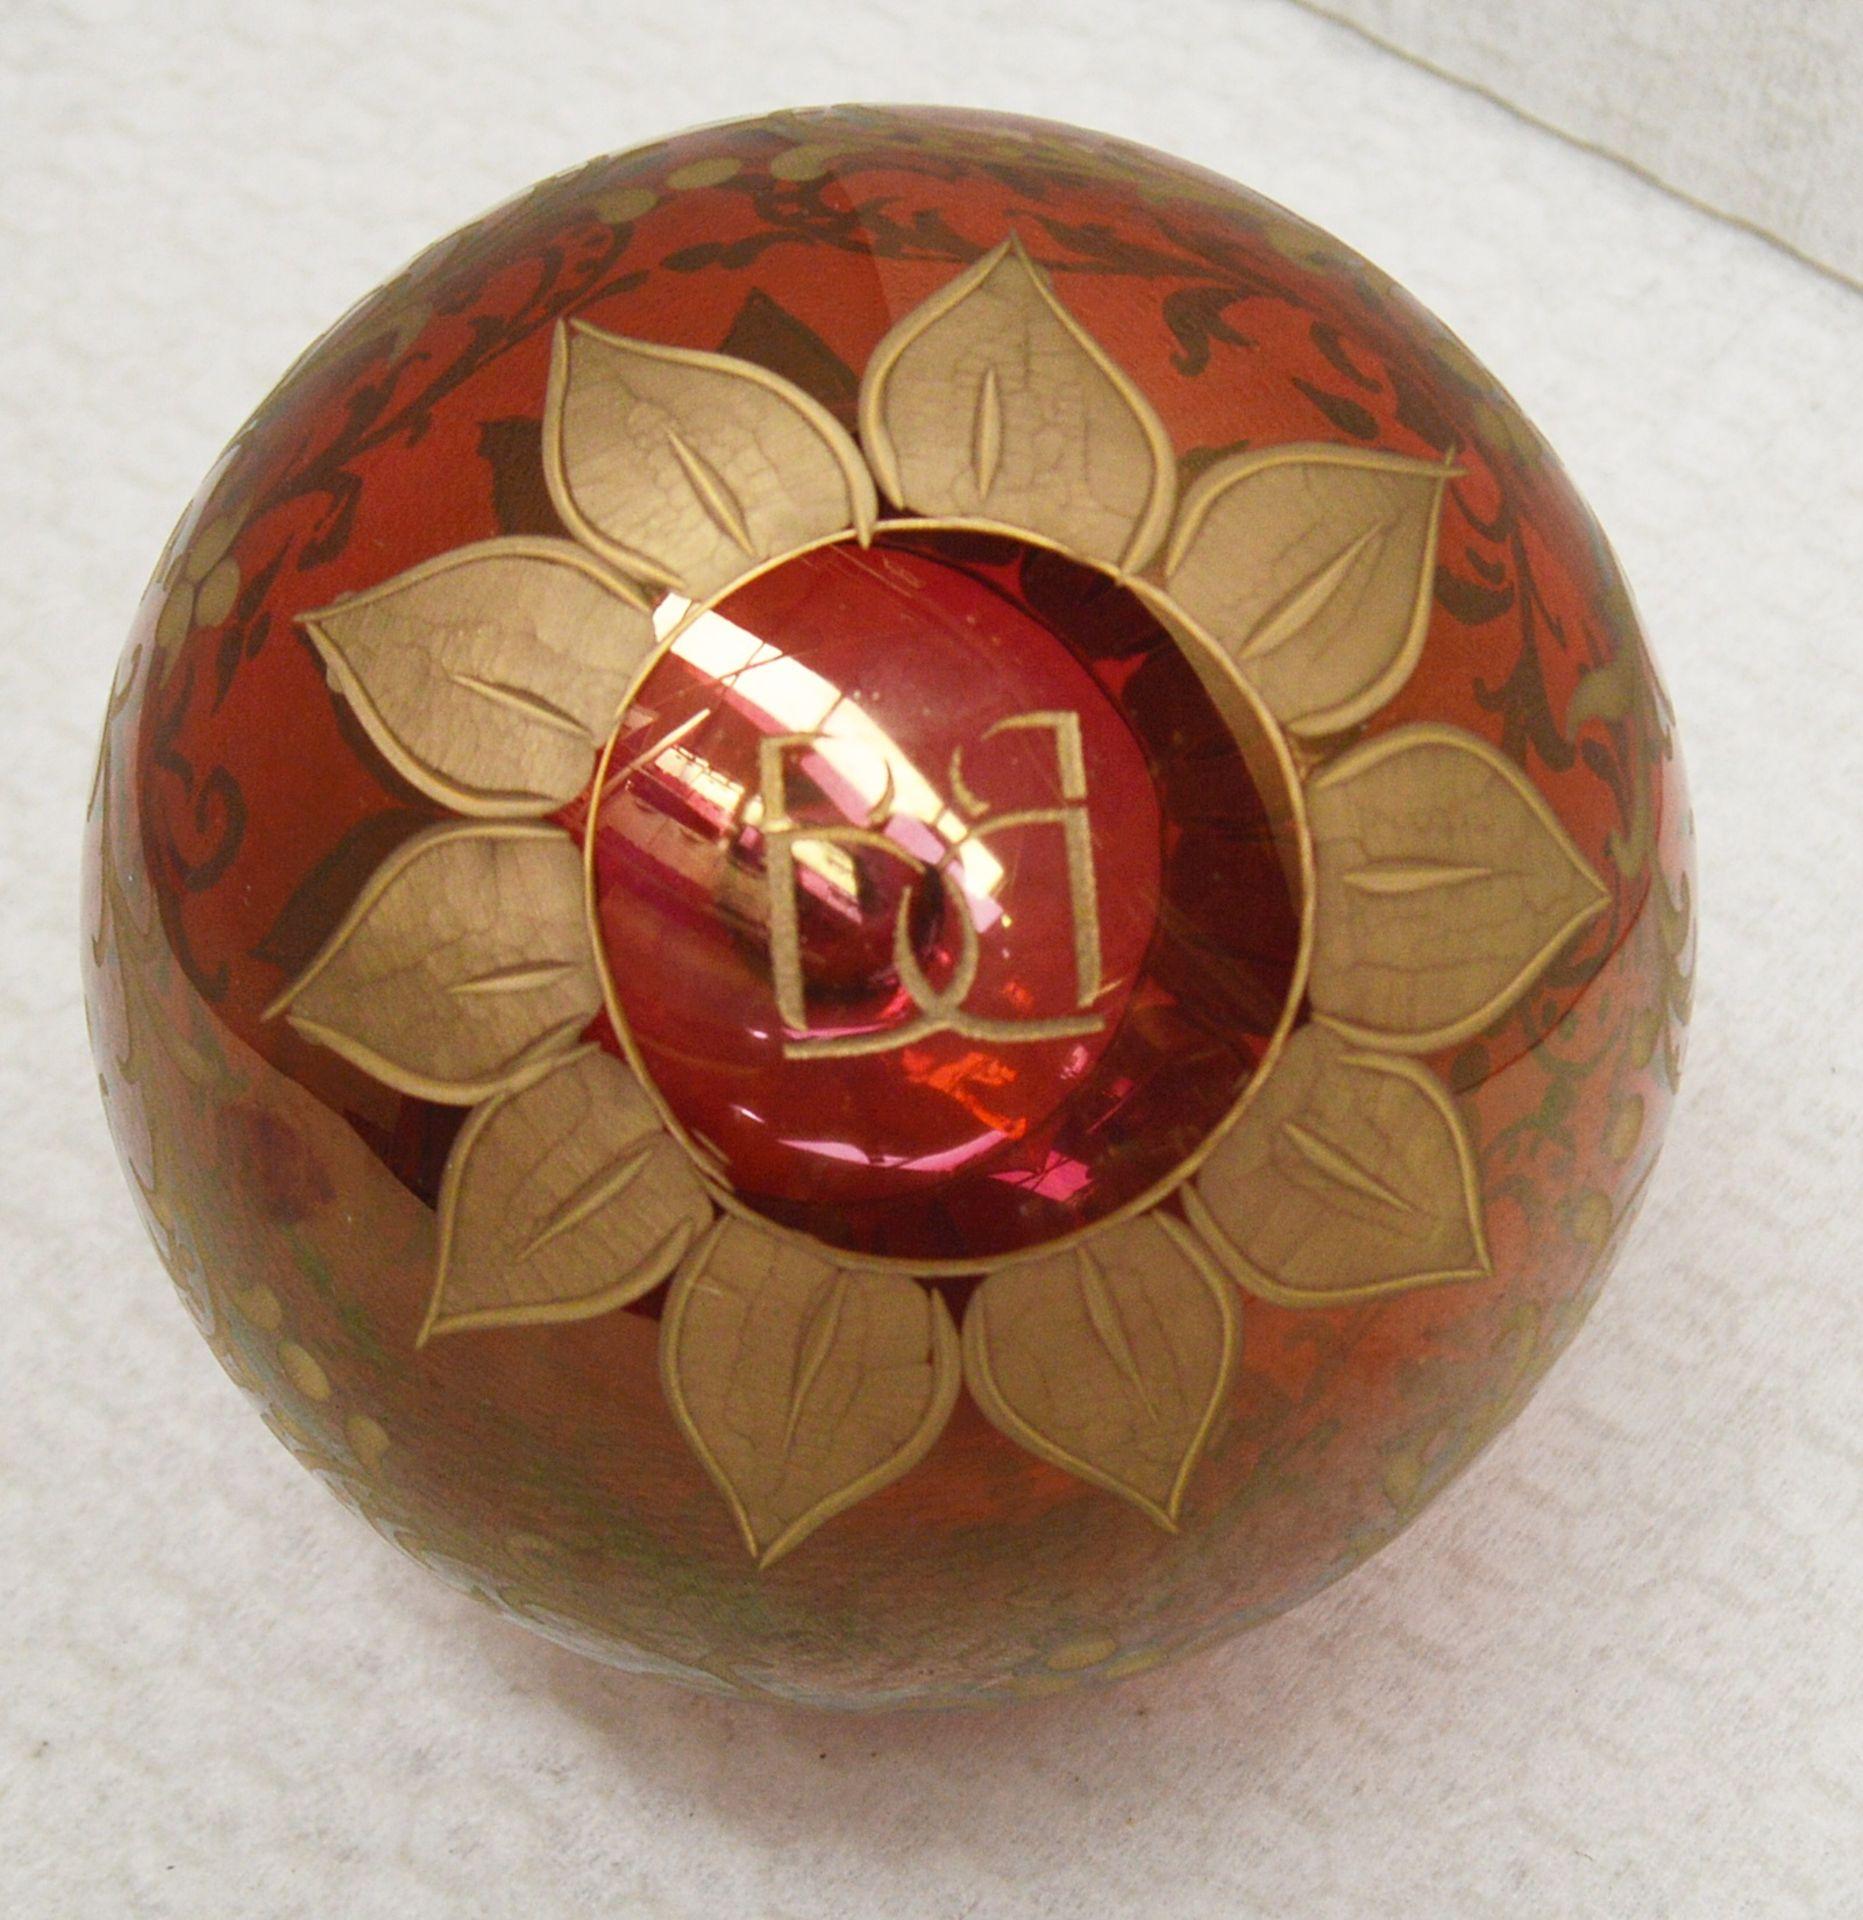 1 x BALDI 'Home Jewels' Italian Hand-crafted Artisan Christmas Tree Decoration - RRP £124.00 - Image 3 of 3